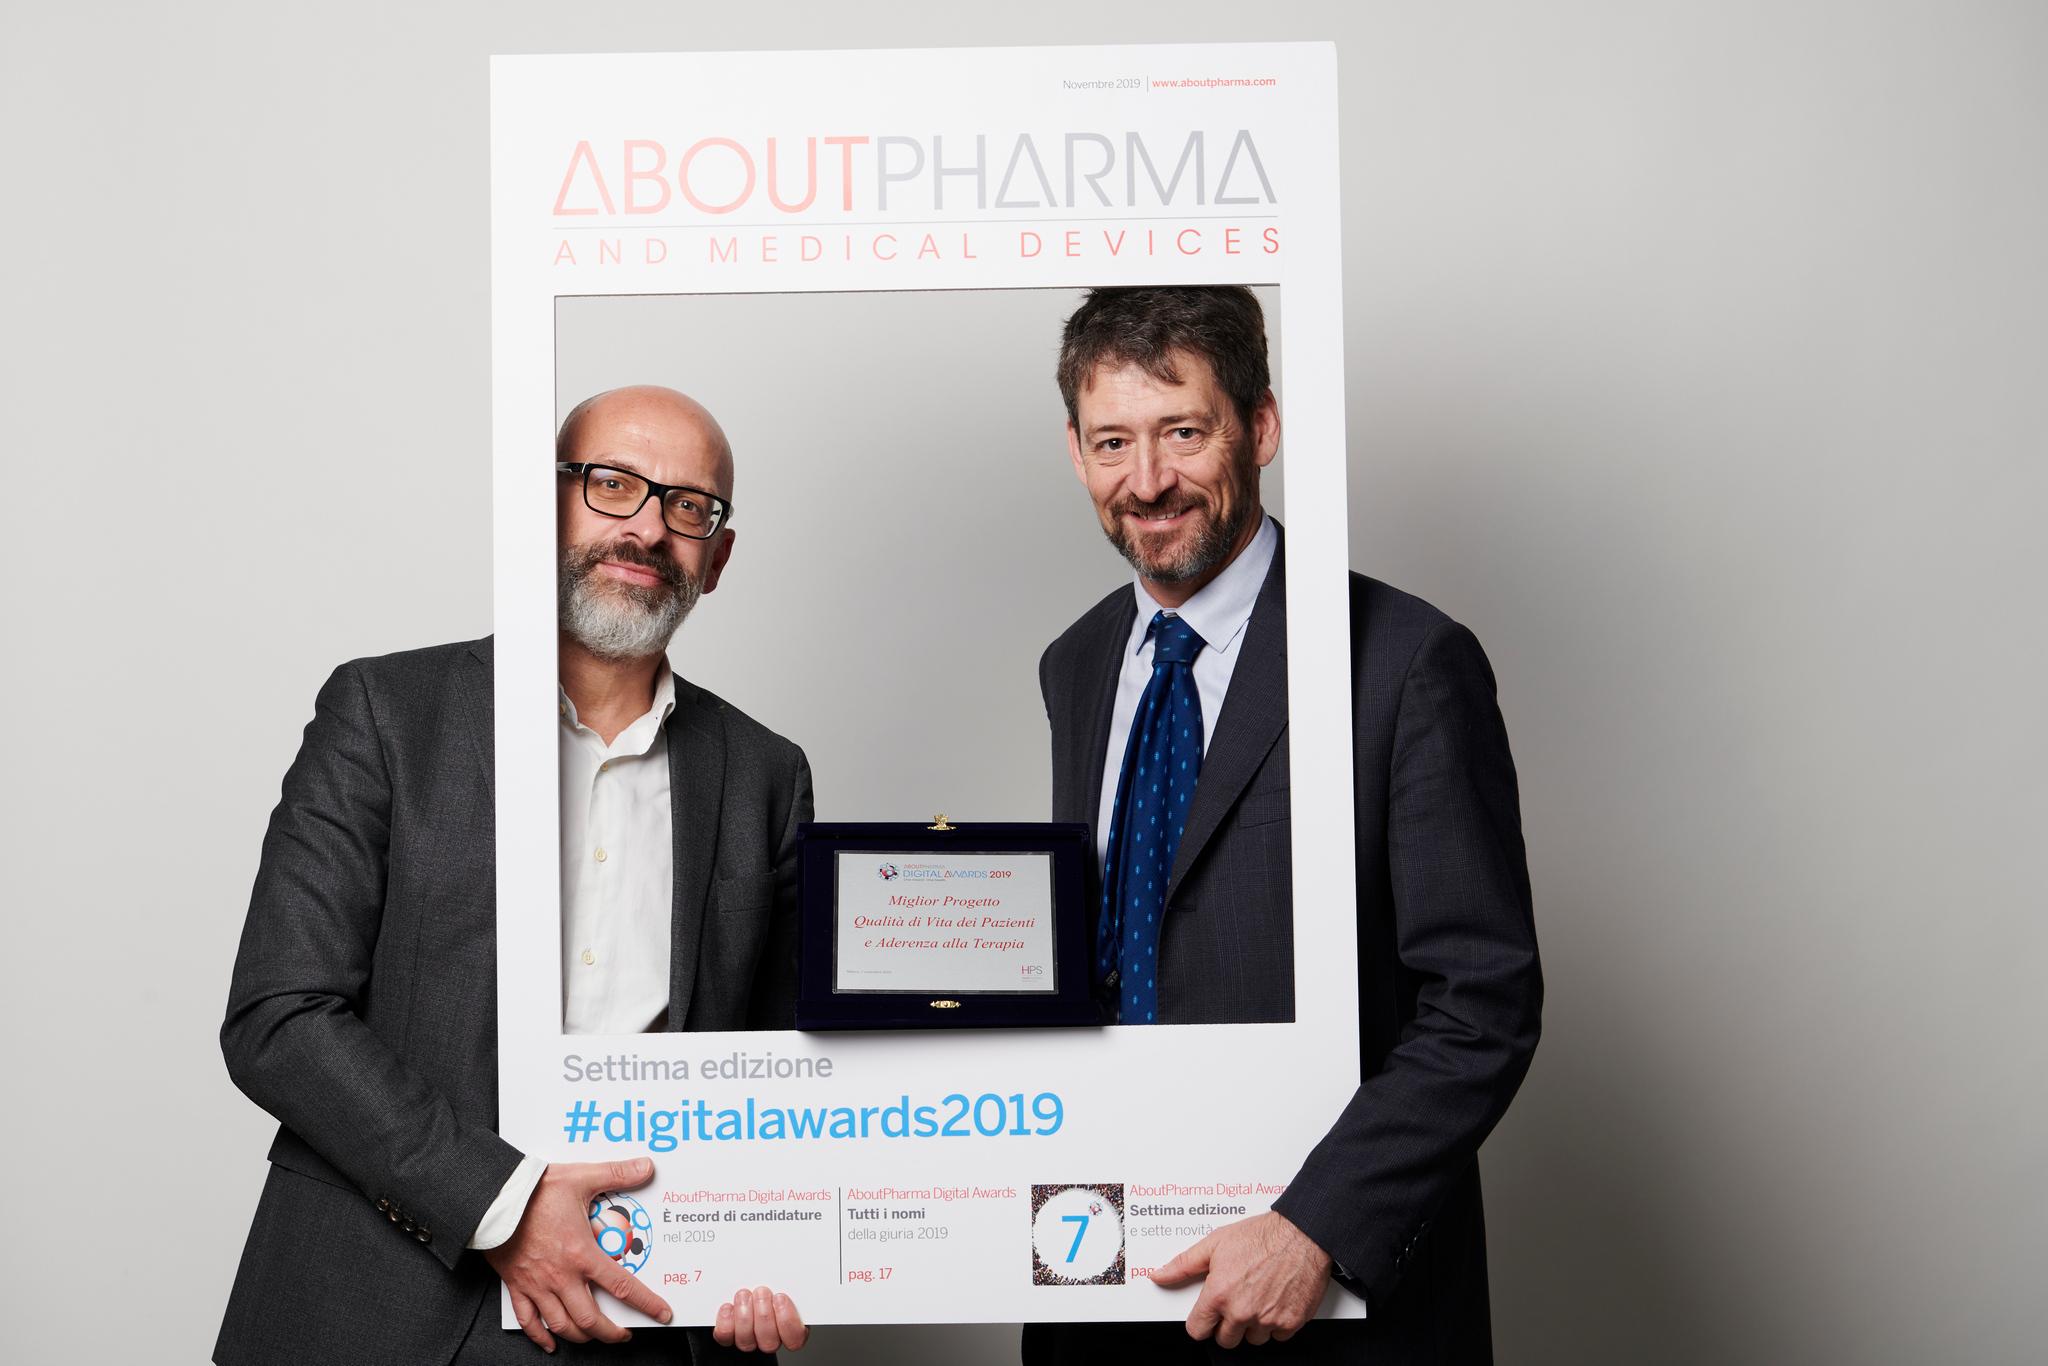 Photobooth AboutPharma Digital Awards 2019_67